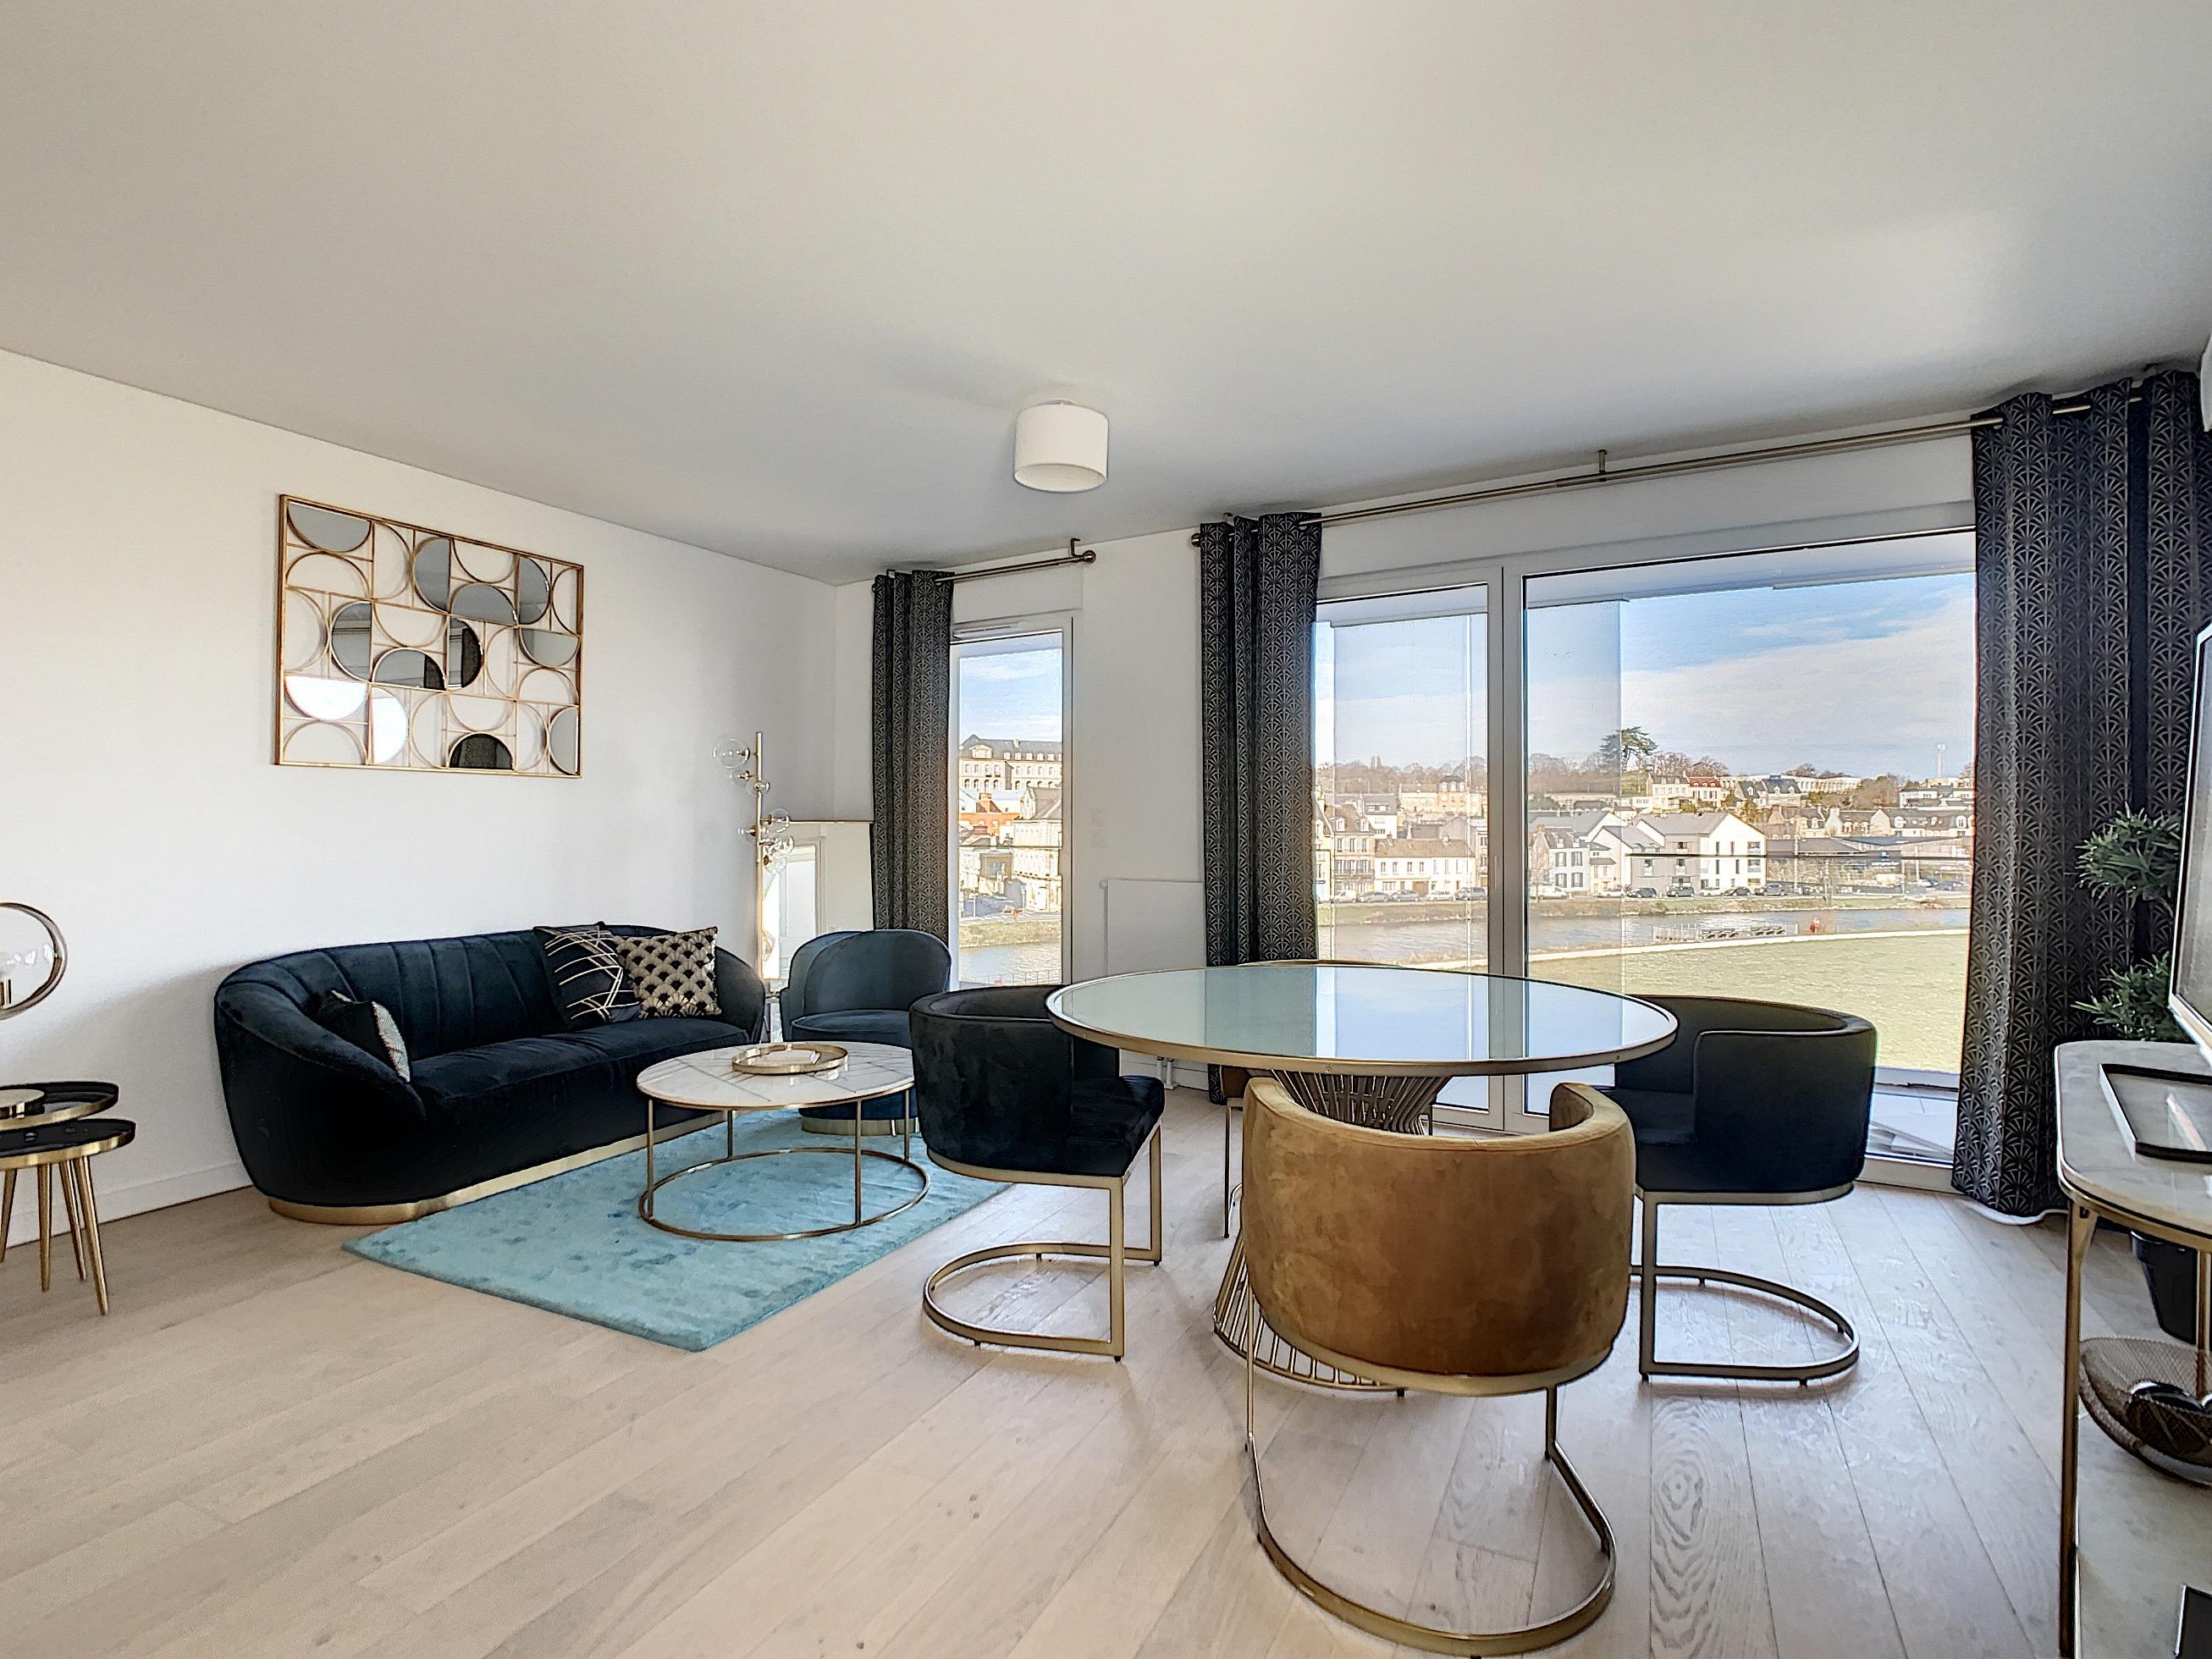 Programme immobilier caen appartement neuf presqu'ile